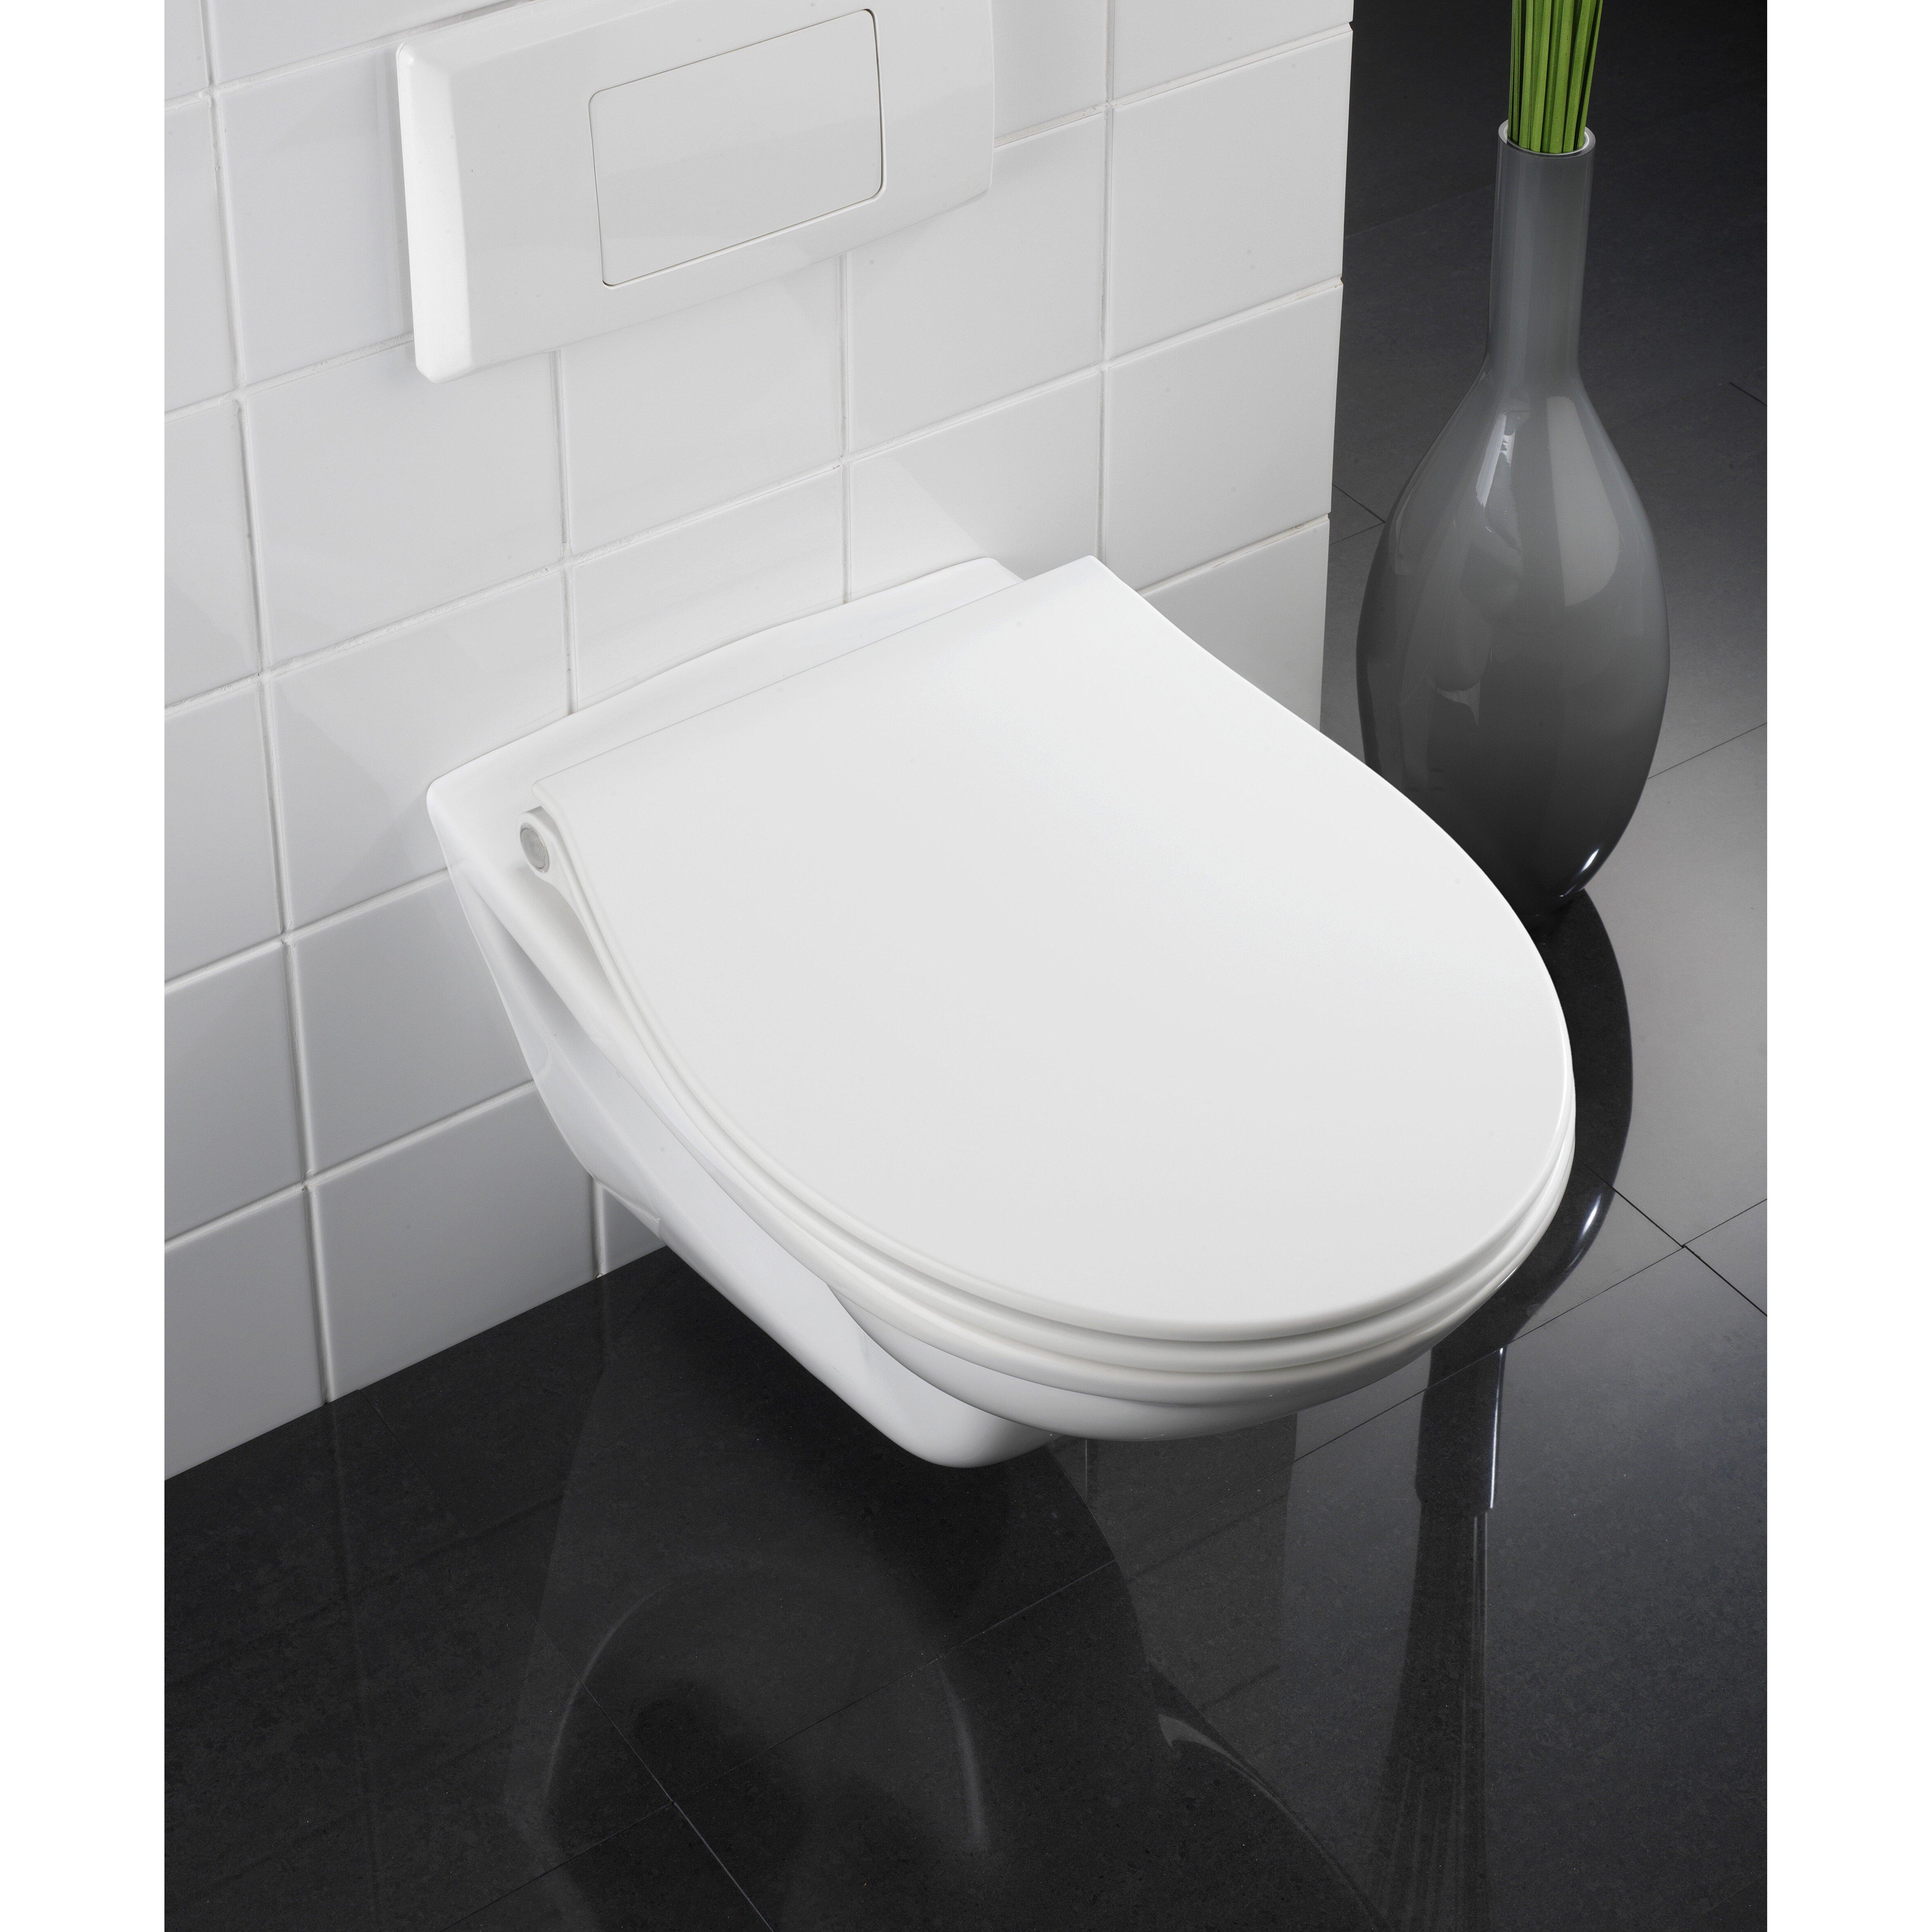 circular toilet seat uk. bemis natural reflections wood round toilet seat ebay . circular uk